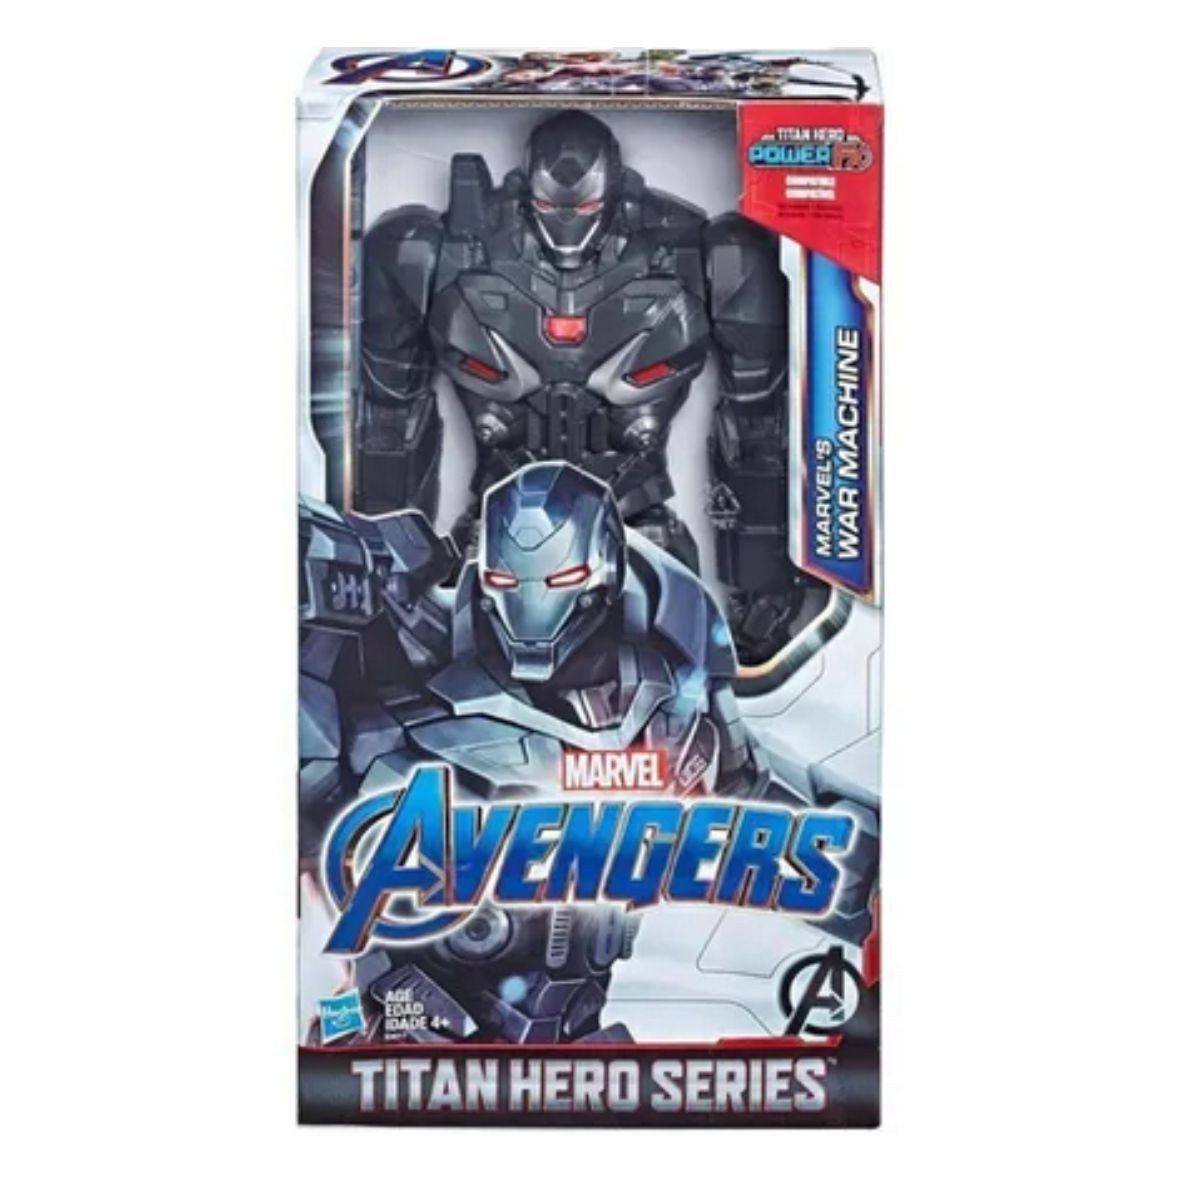 Boneco Articulado Titan War Machine Power FX Avengers - Hasbro